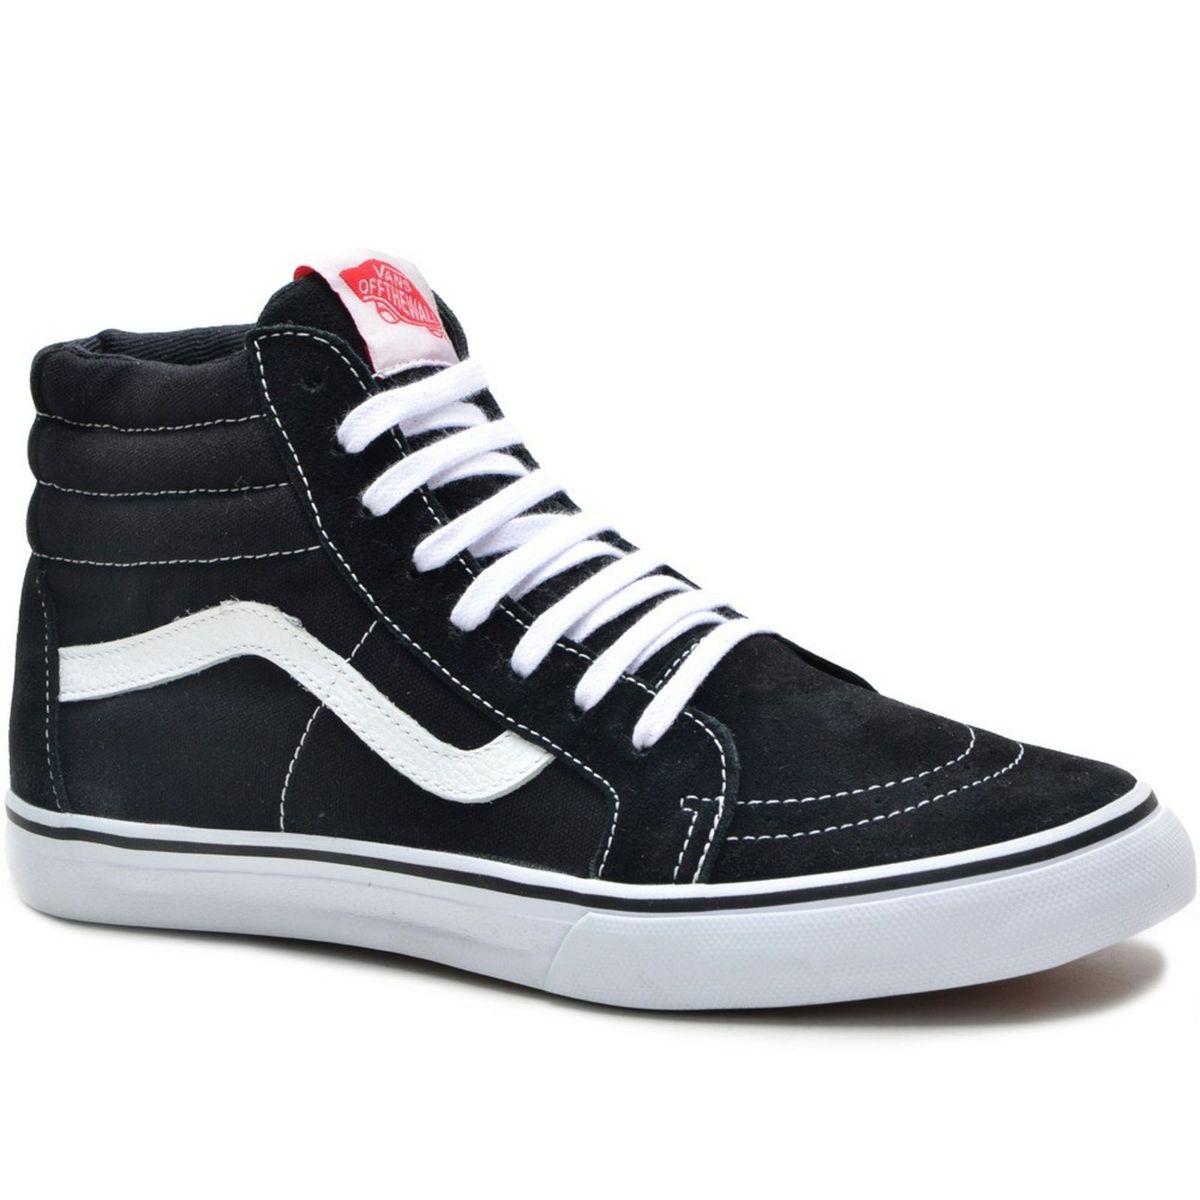 3ebbf4c70 Tênis Vans Old Skool Cano Alto - Botinha | Tênis Masculino Vans Nunca Usado  29884802 | enjoei